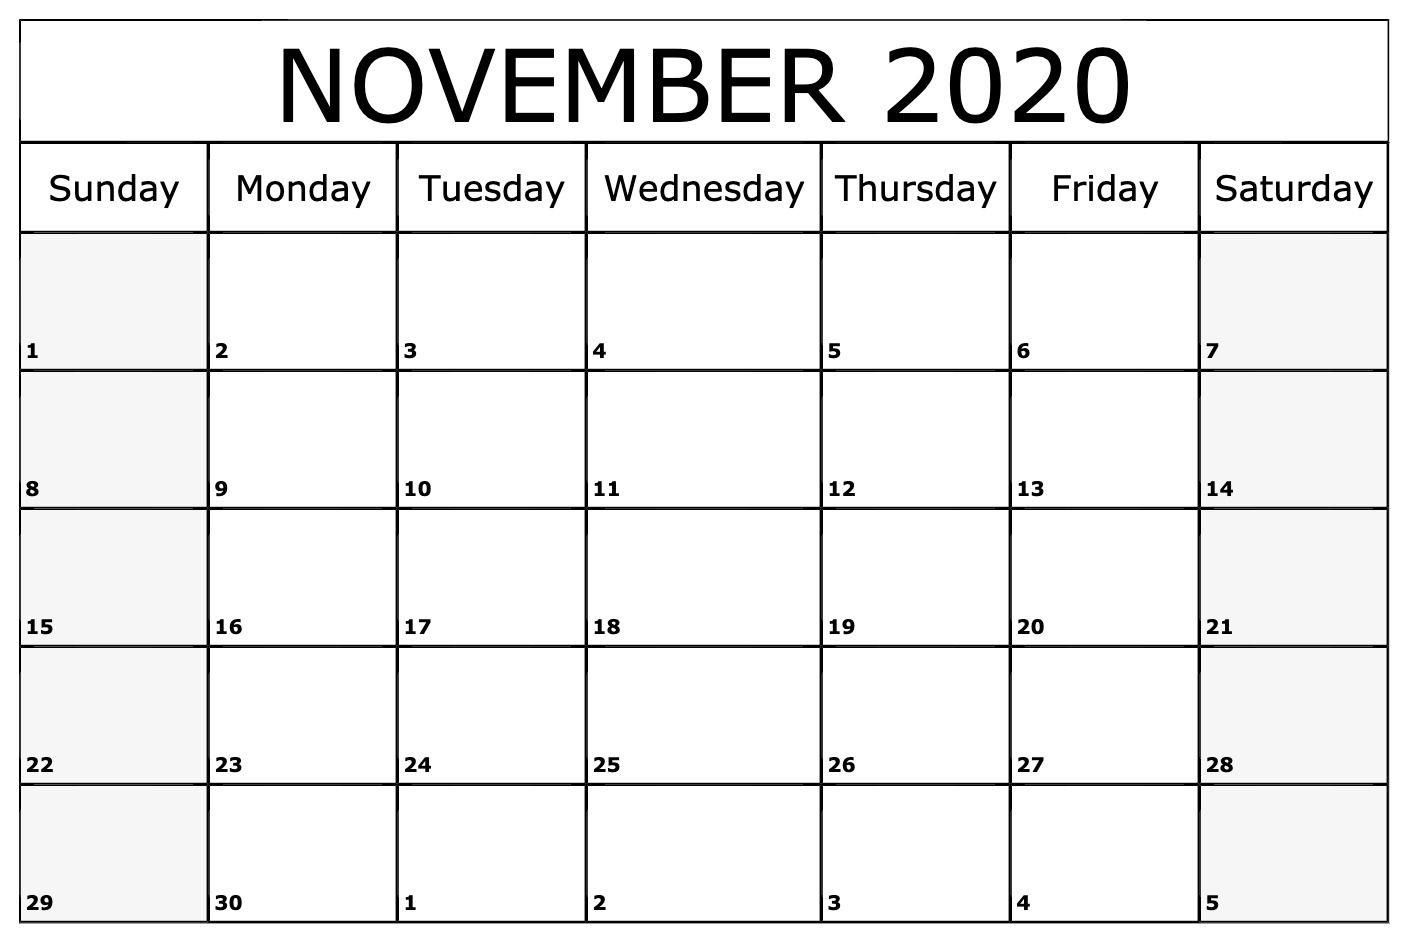 November 2020 Calendar Printable Template   Printable